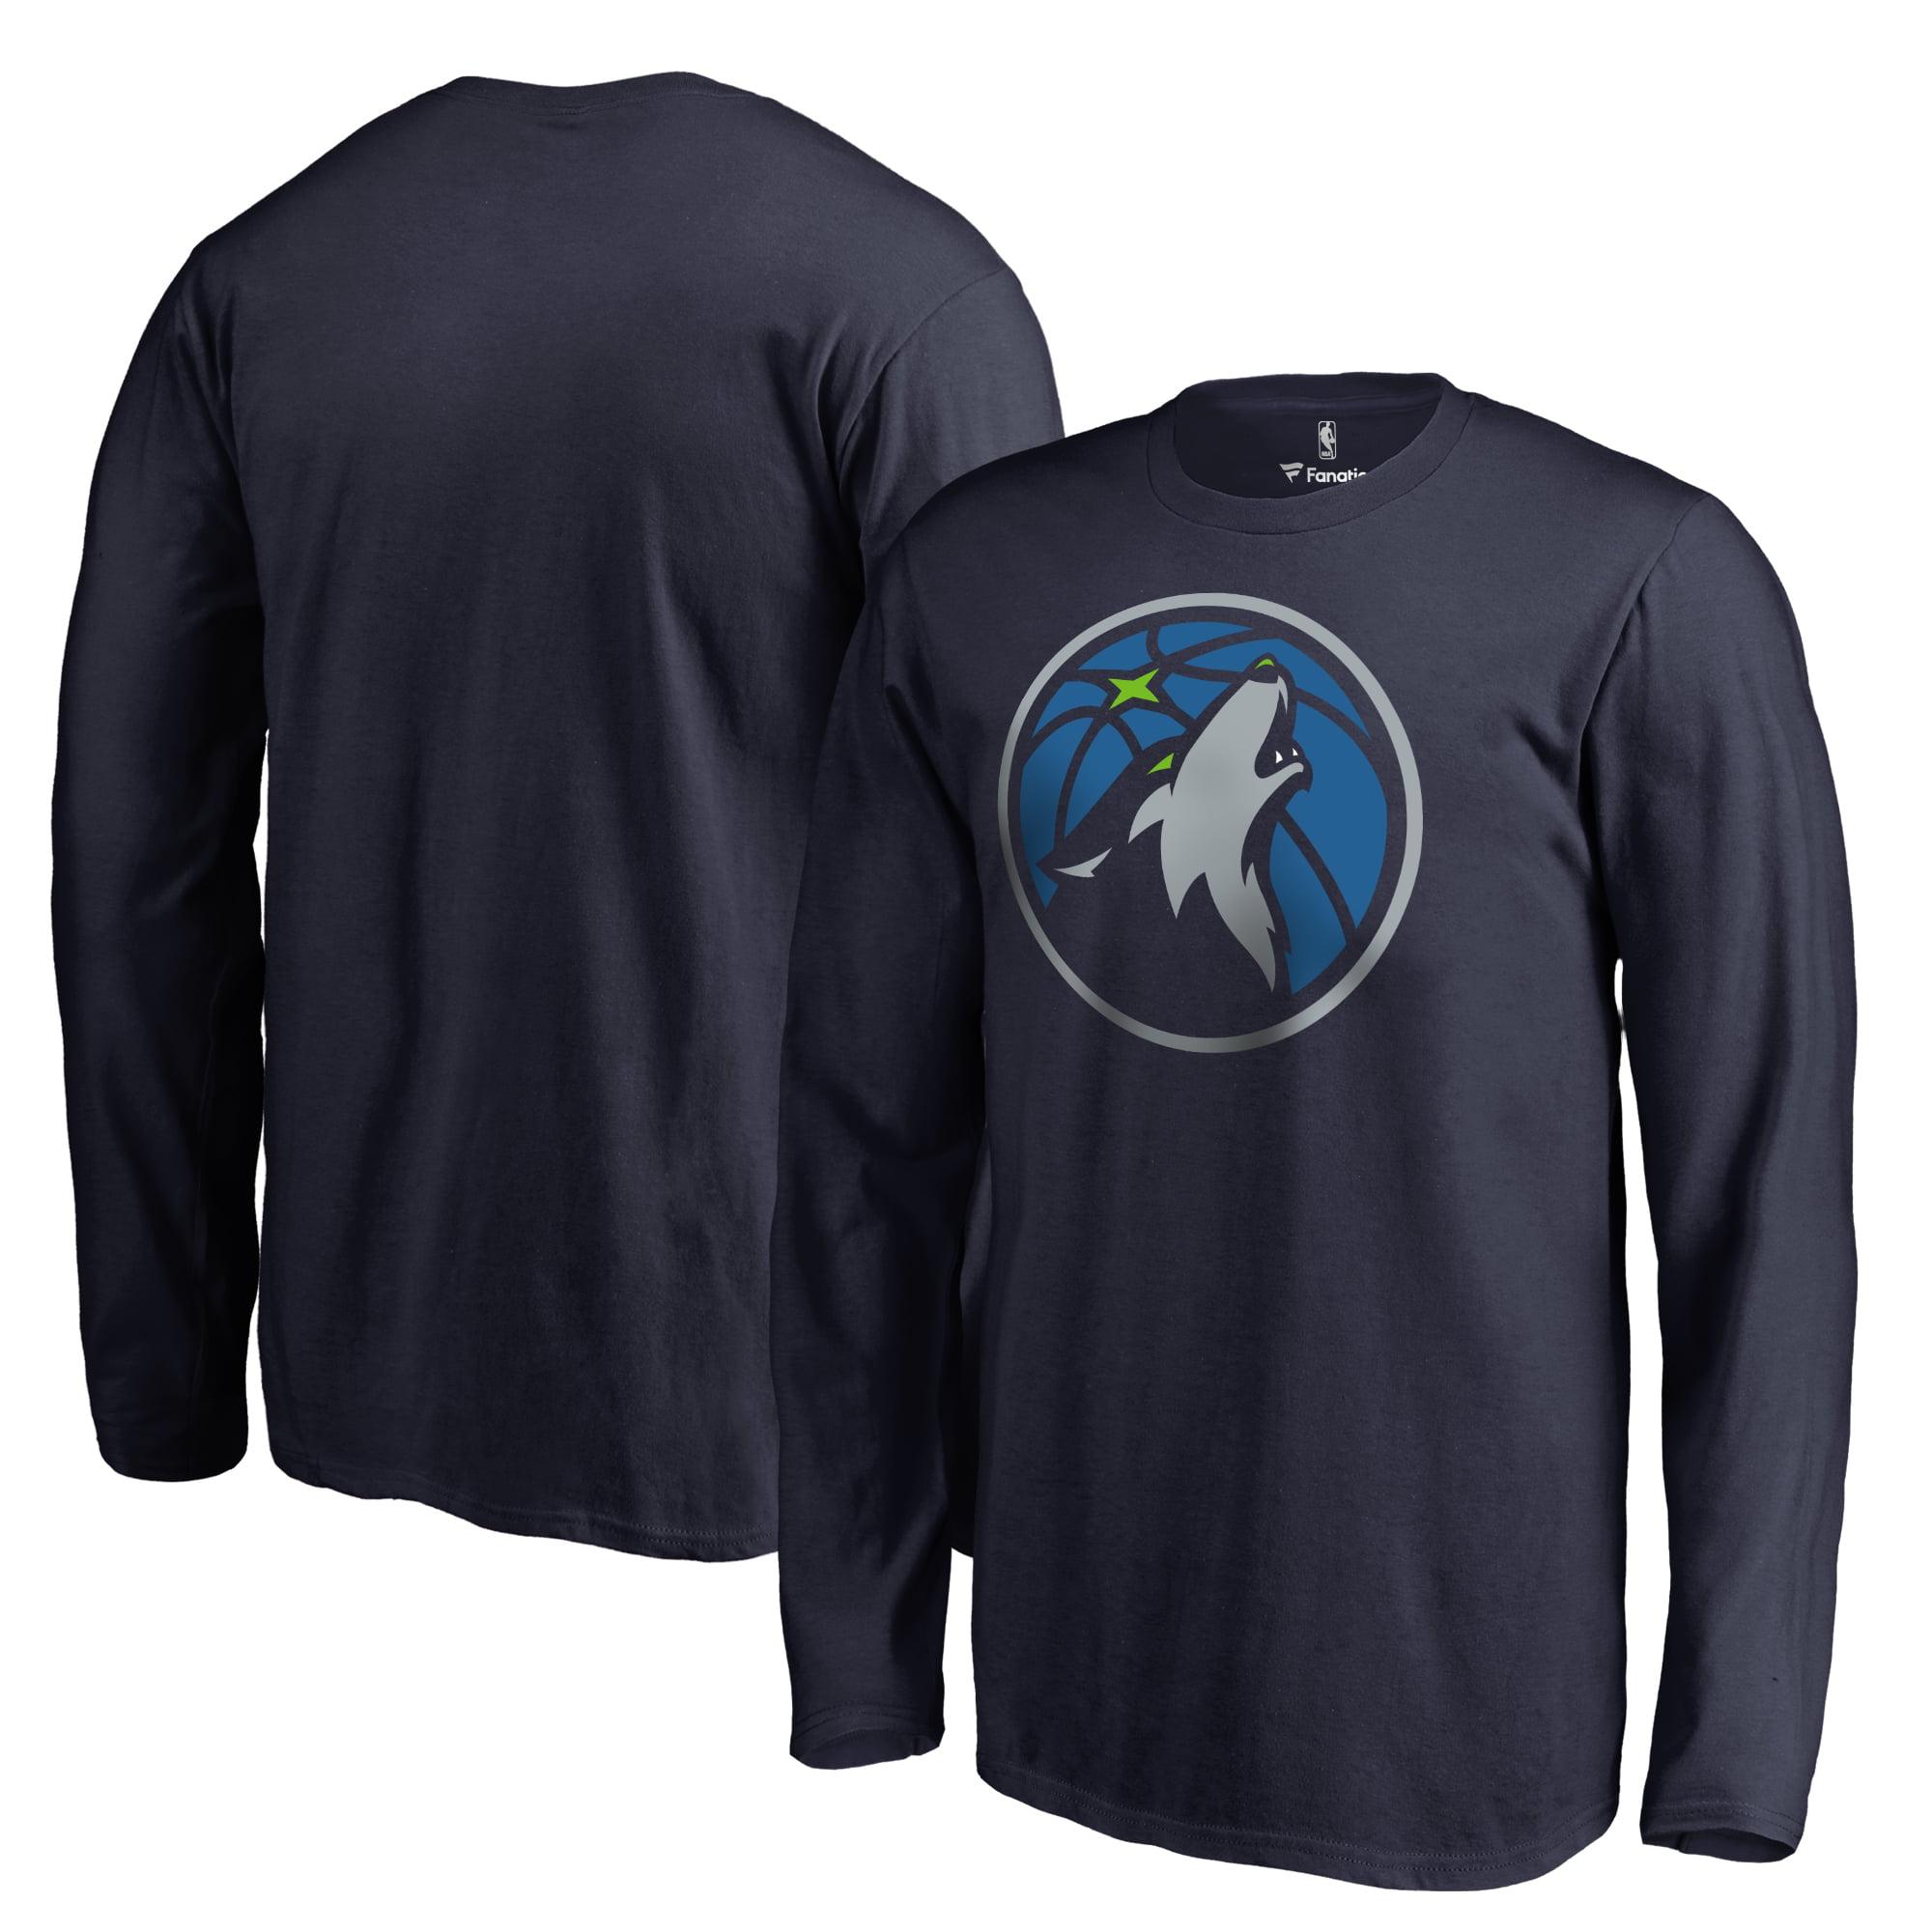 Minnesota Timberwolves Fanatics Branded Youth Primary Logo Long Sleeve T-Shirt - Navy